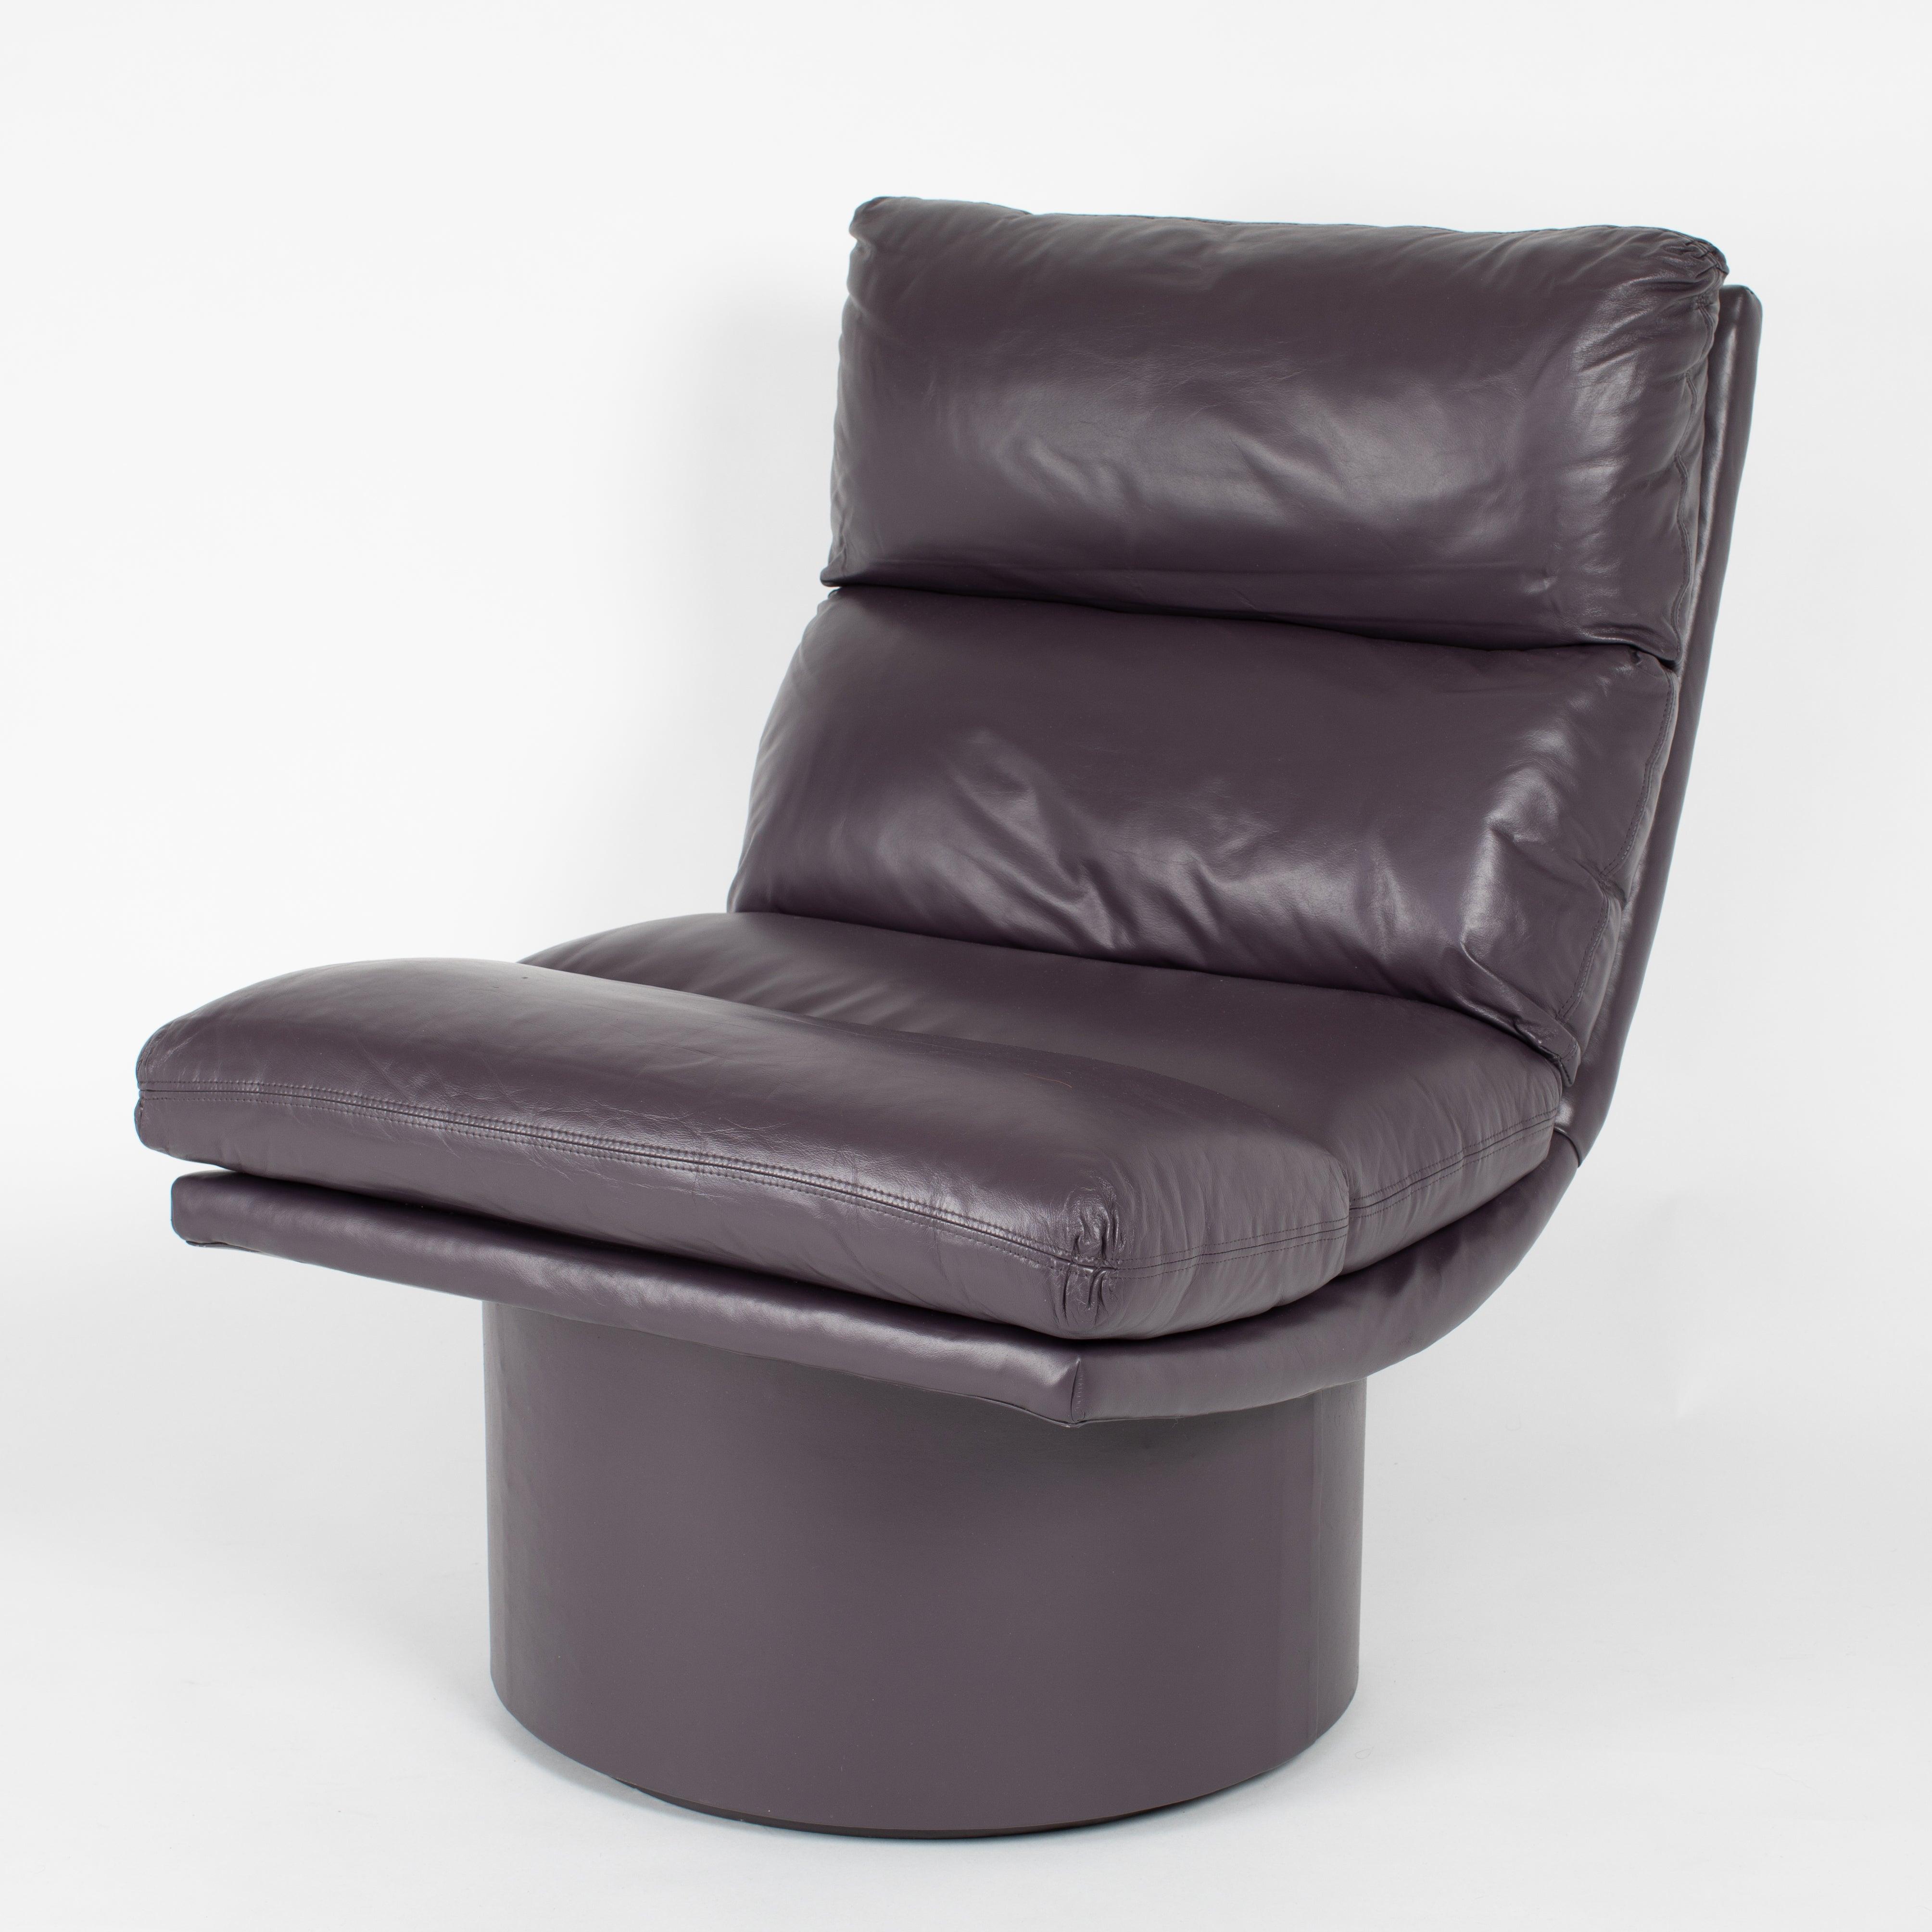 Stupendous Eggplant Leather Scoop Chairs On Swivel Bases Circa 1980S Evergreenethics Interior Chair Design Evergreenethicsorg